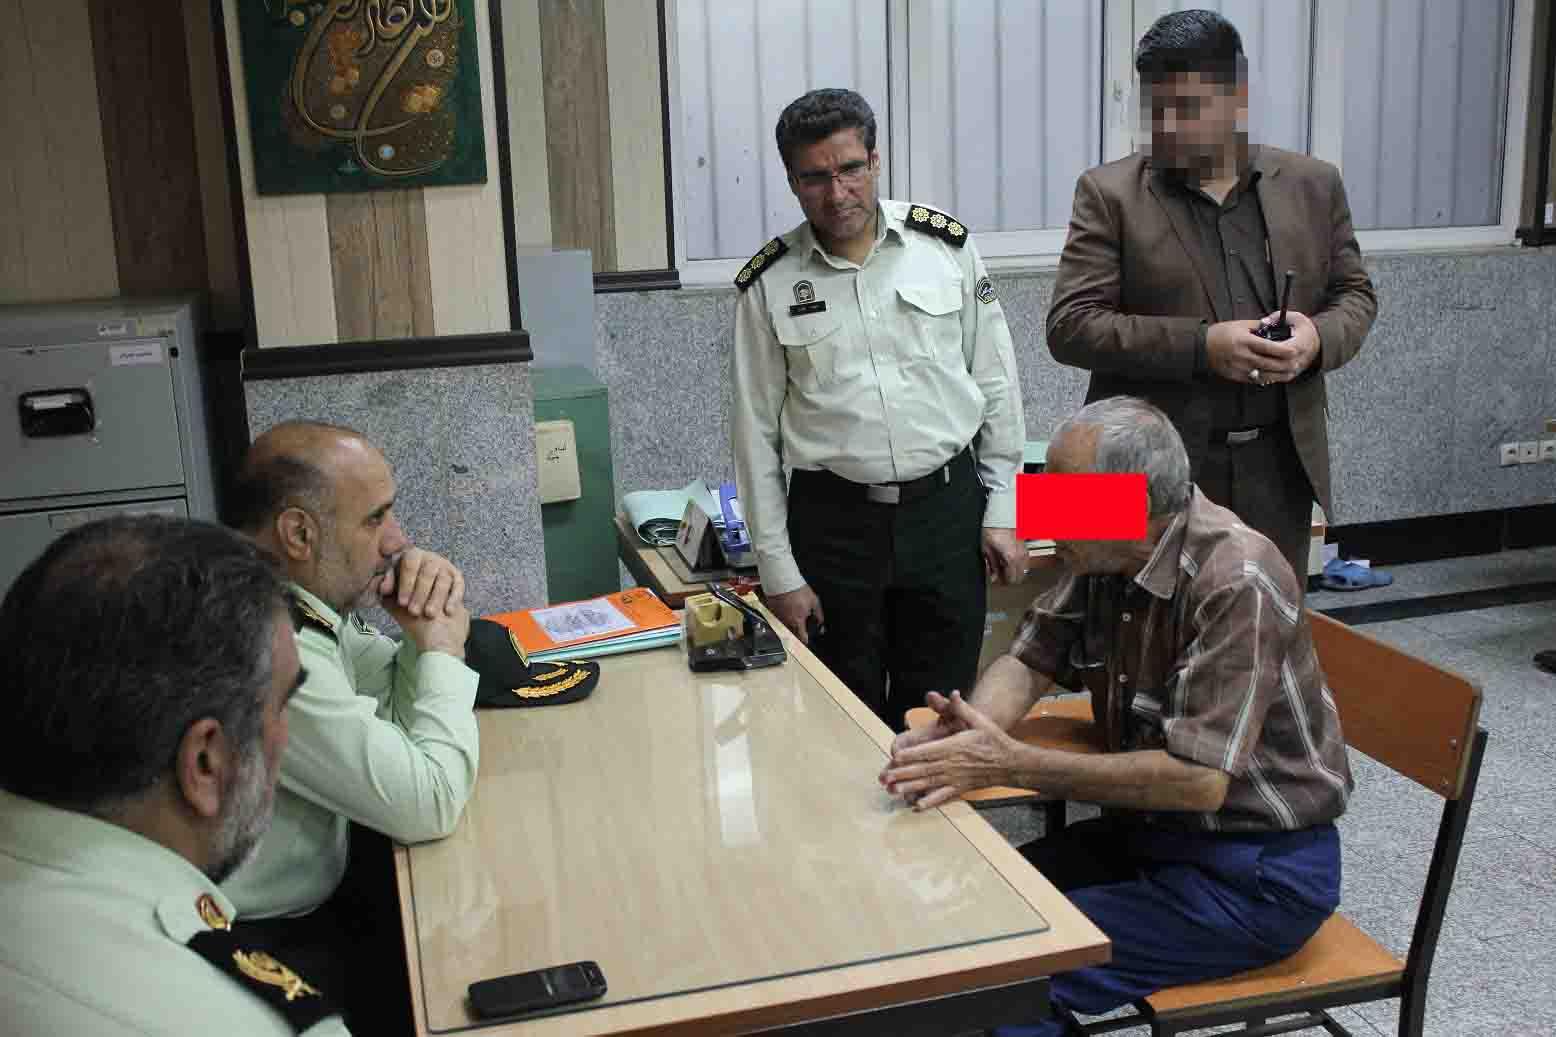 گفتوگو با عامل جنایت هولناک خیابان شیخبهایی